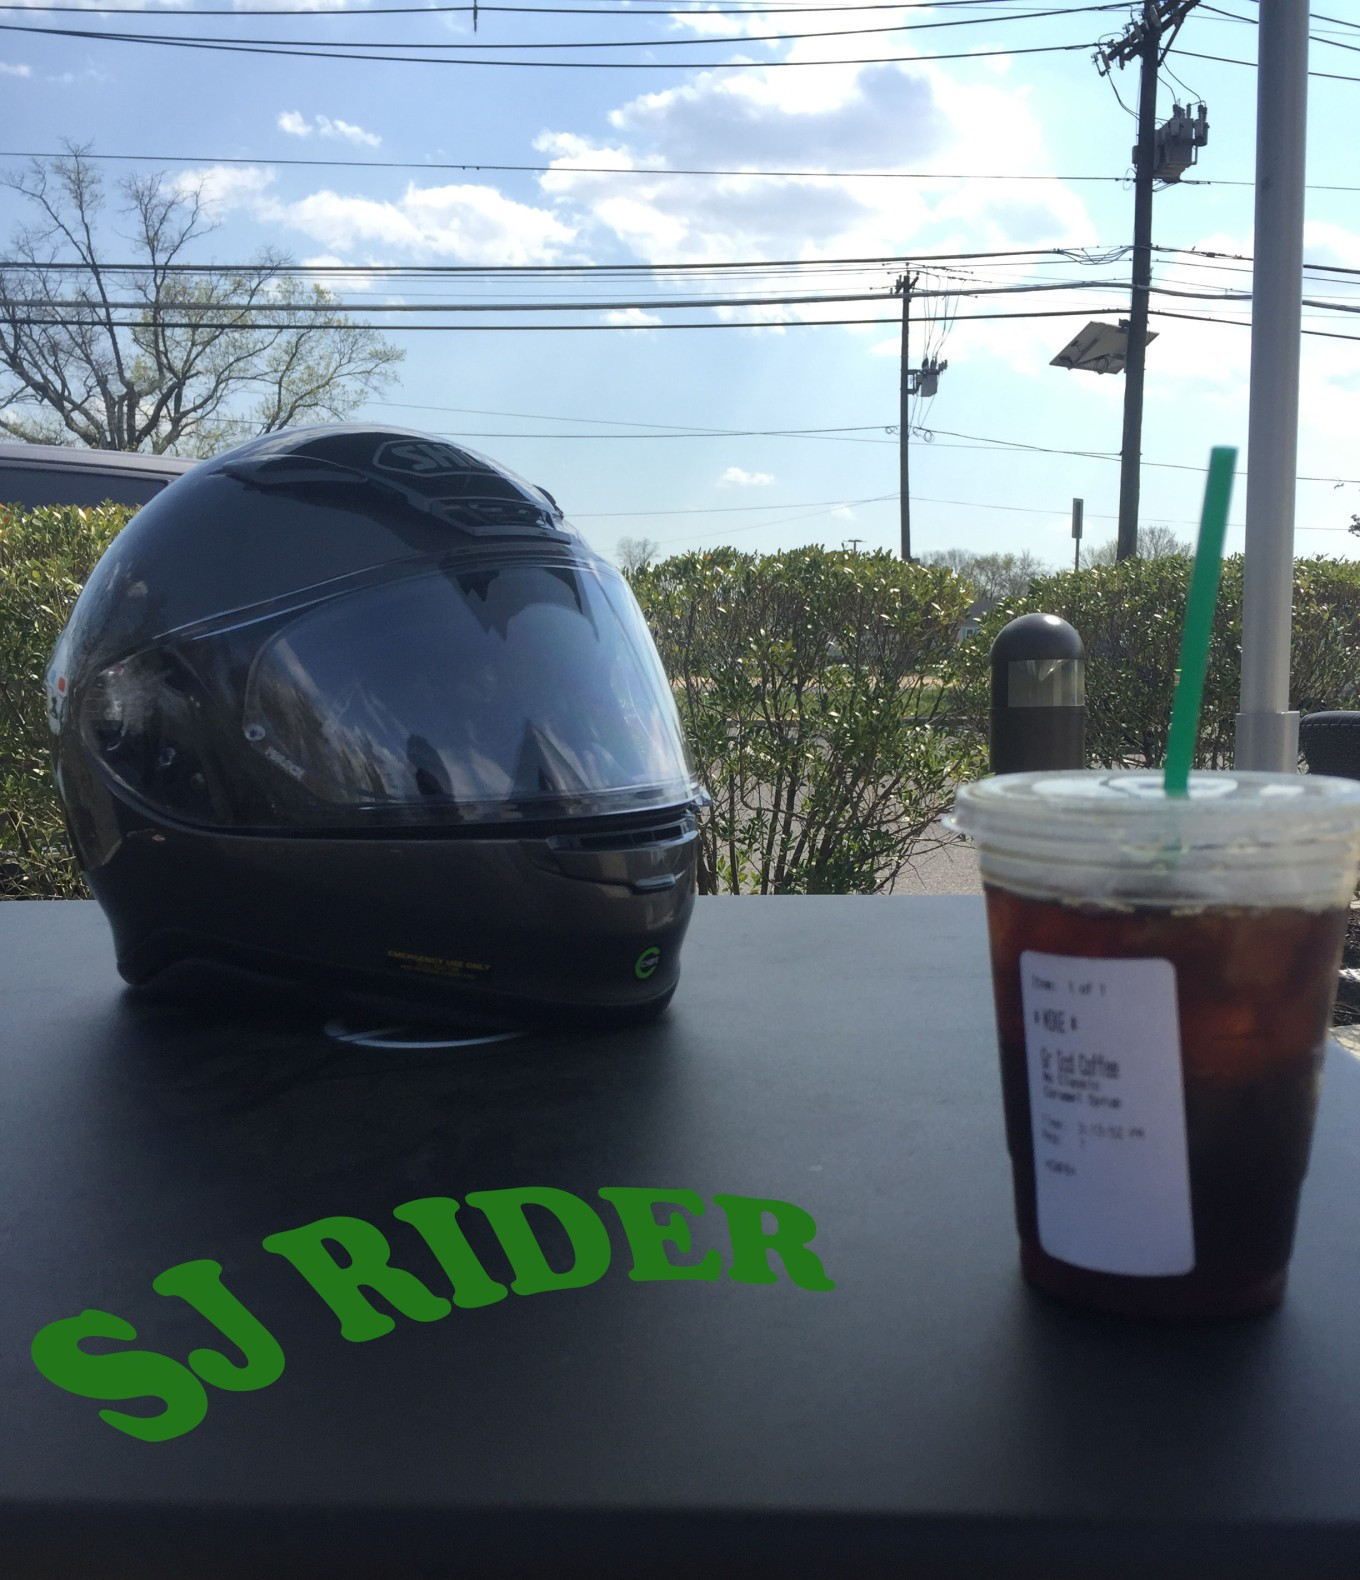 SJ Rider Haeder